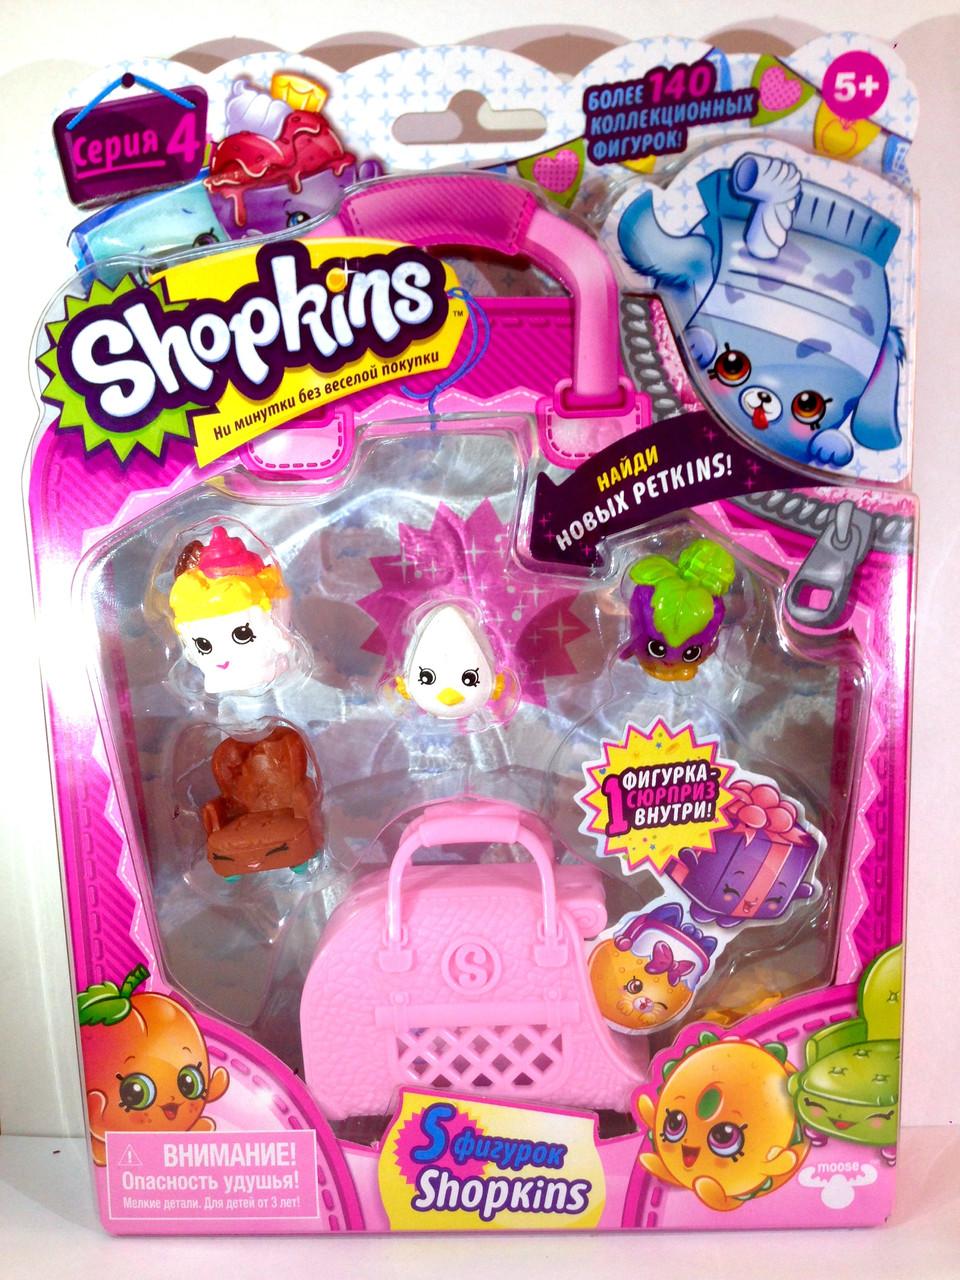 Shopkins, Шопкинс (4 сезон) 5 игрушек в упаковке (яичко)